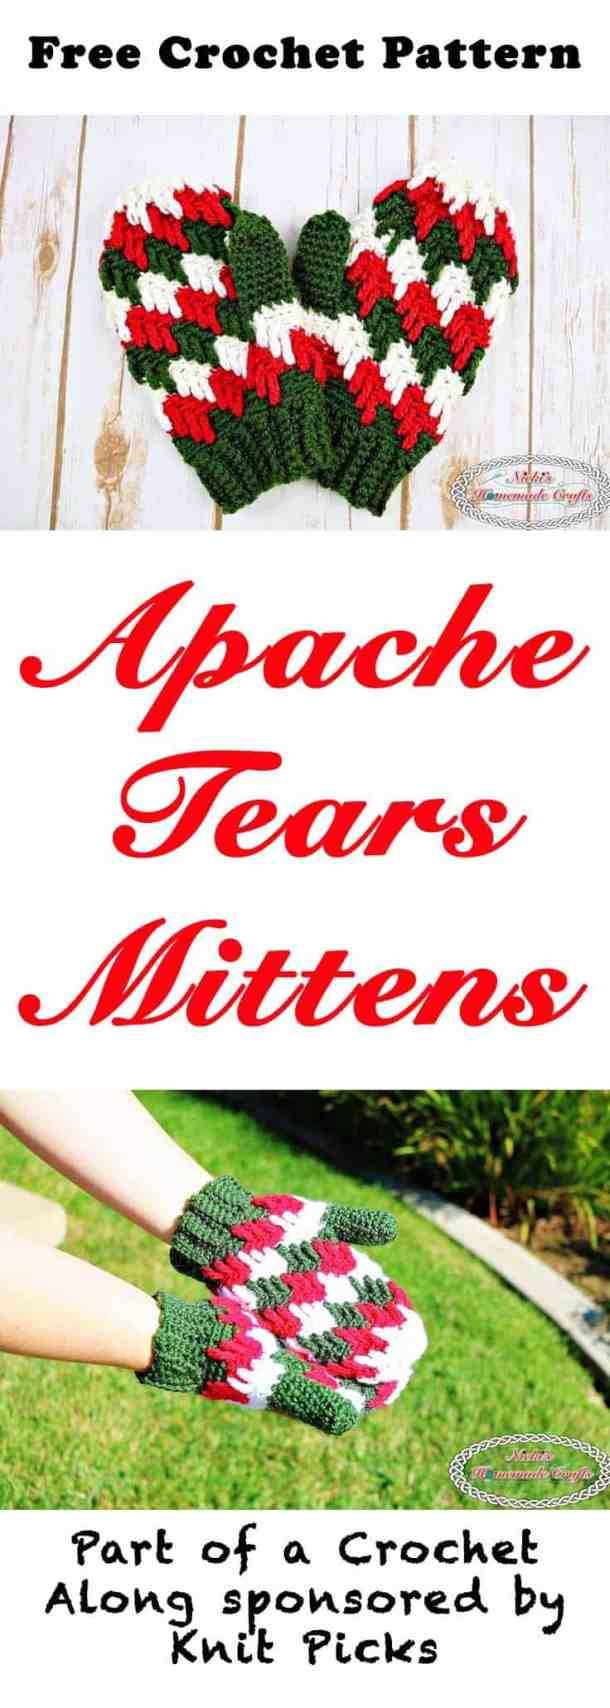 Apache Tears Mittens - Free Crochet Pattern - Crochet Along by Nicki's Homemade Crafts #crochet #freecrochetpattern #mittens #gloves #apachetears #crochetalong #knitpicks